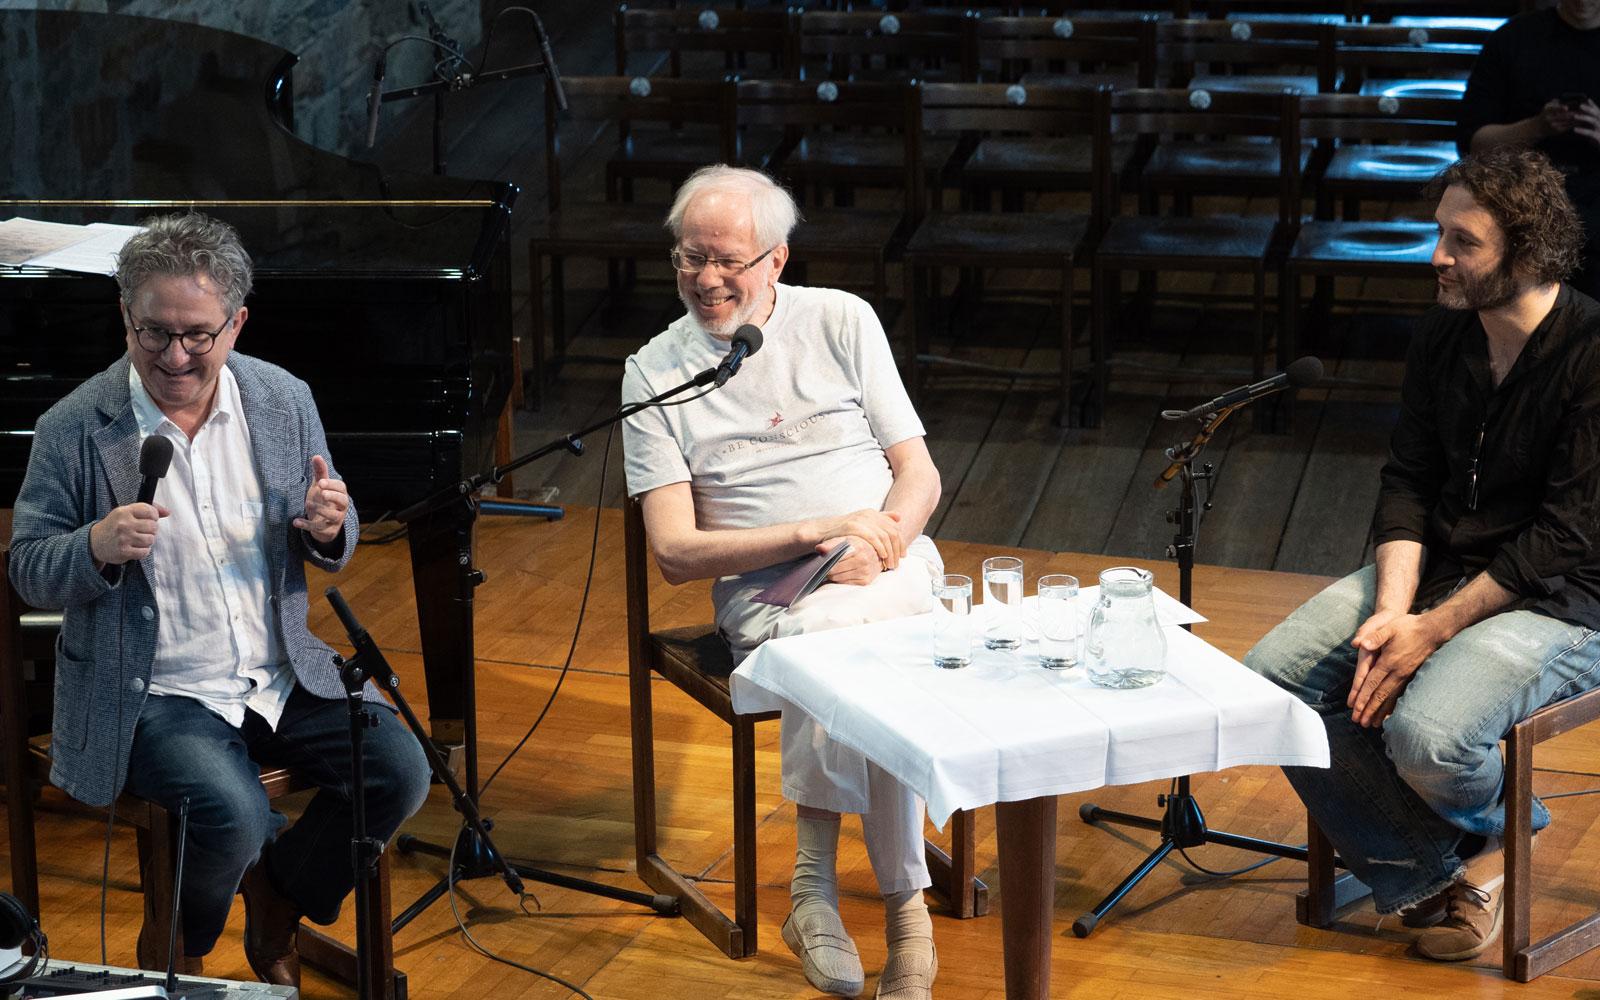 Helmut Jasbar, Gidon Kremer and Nicolas Altstaedt